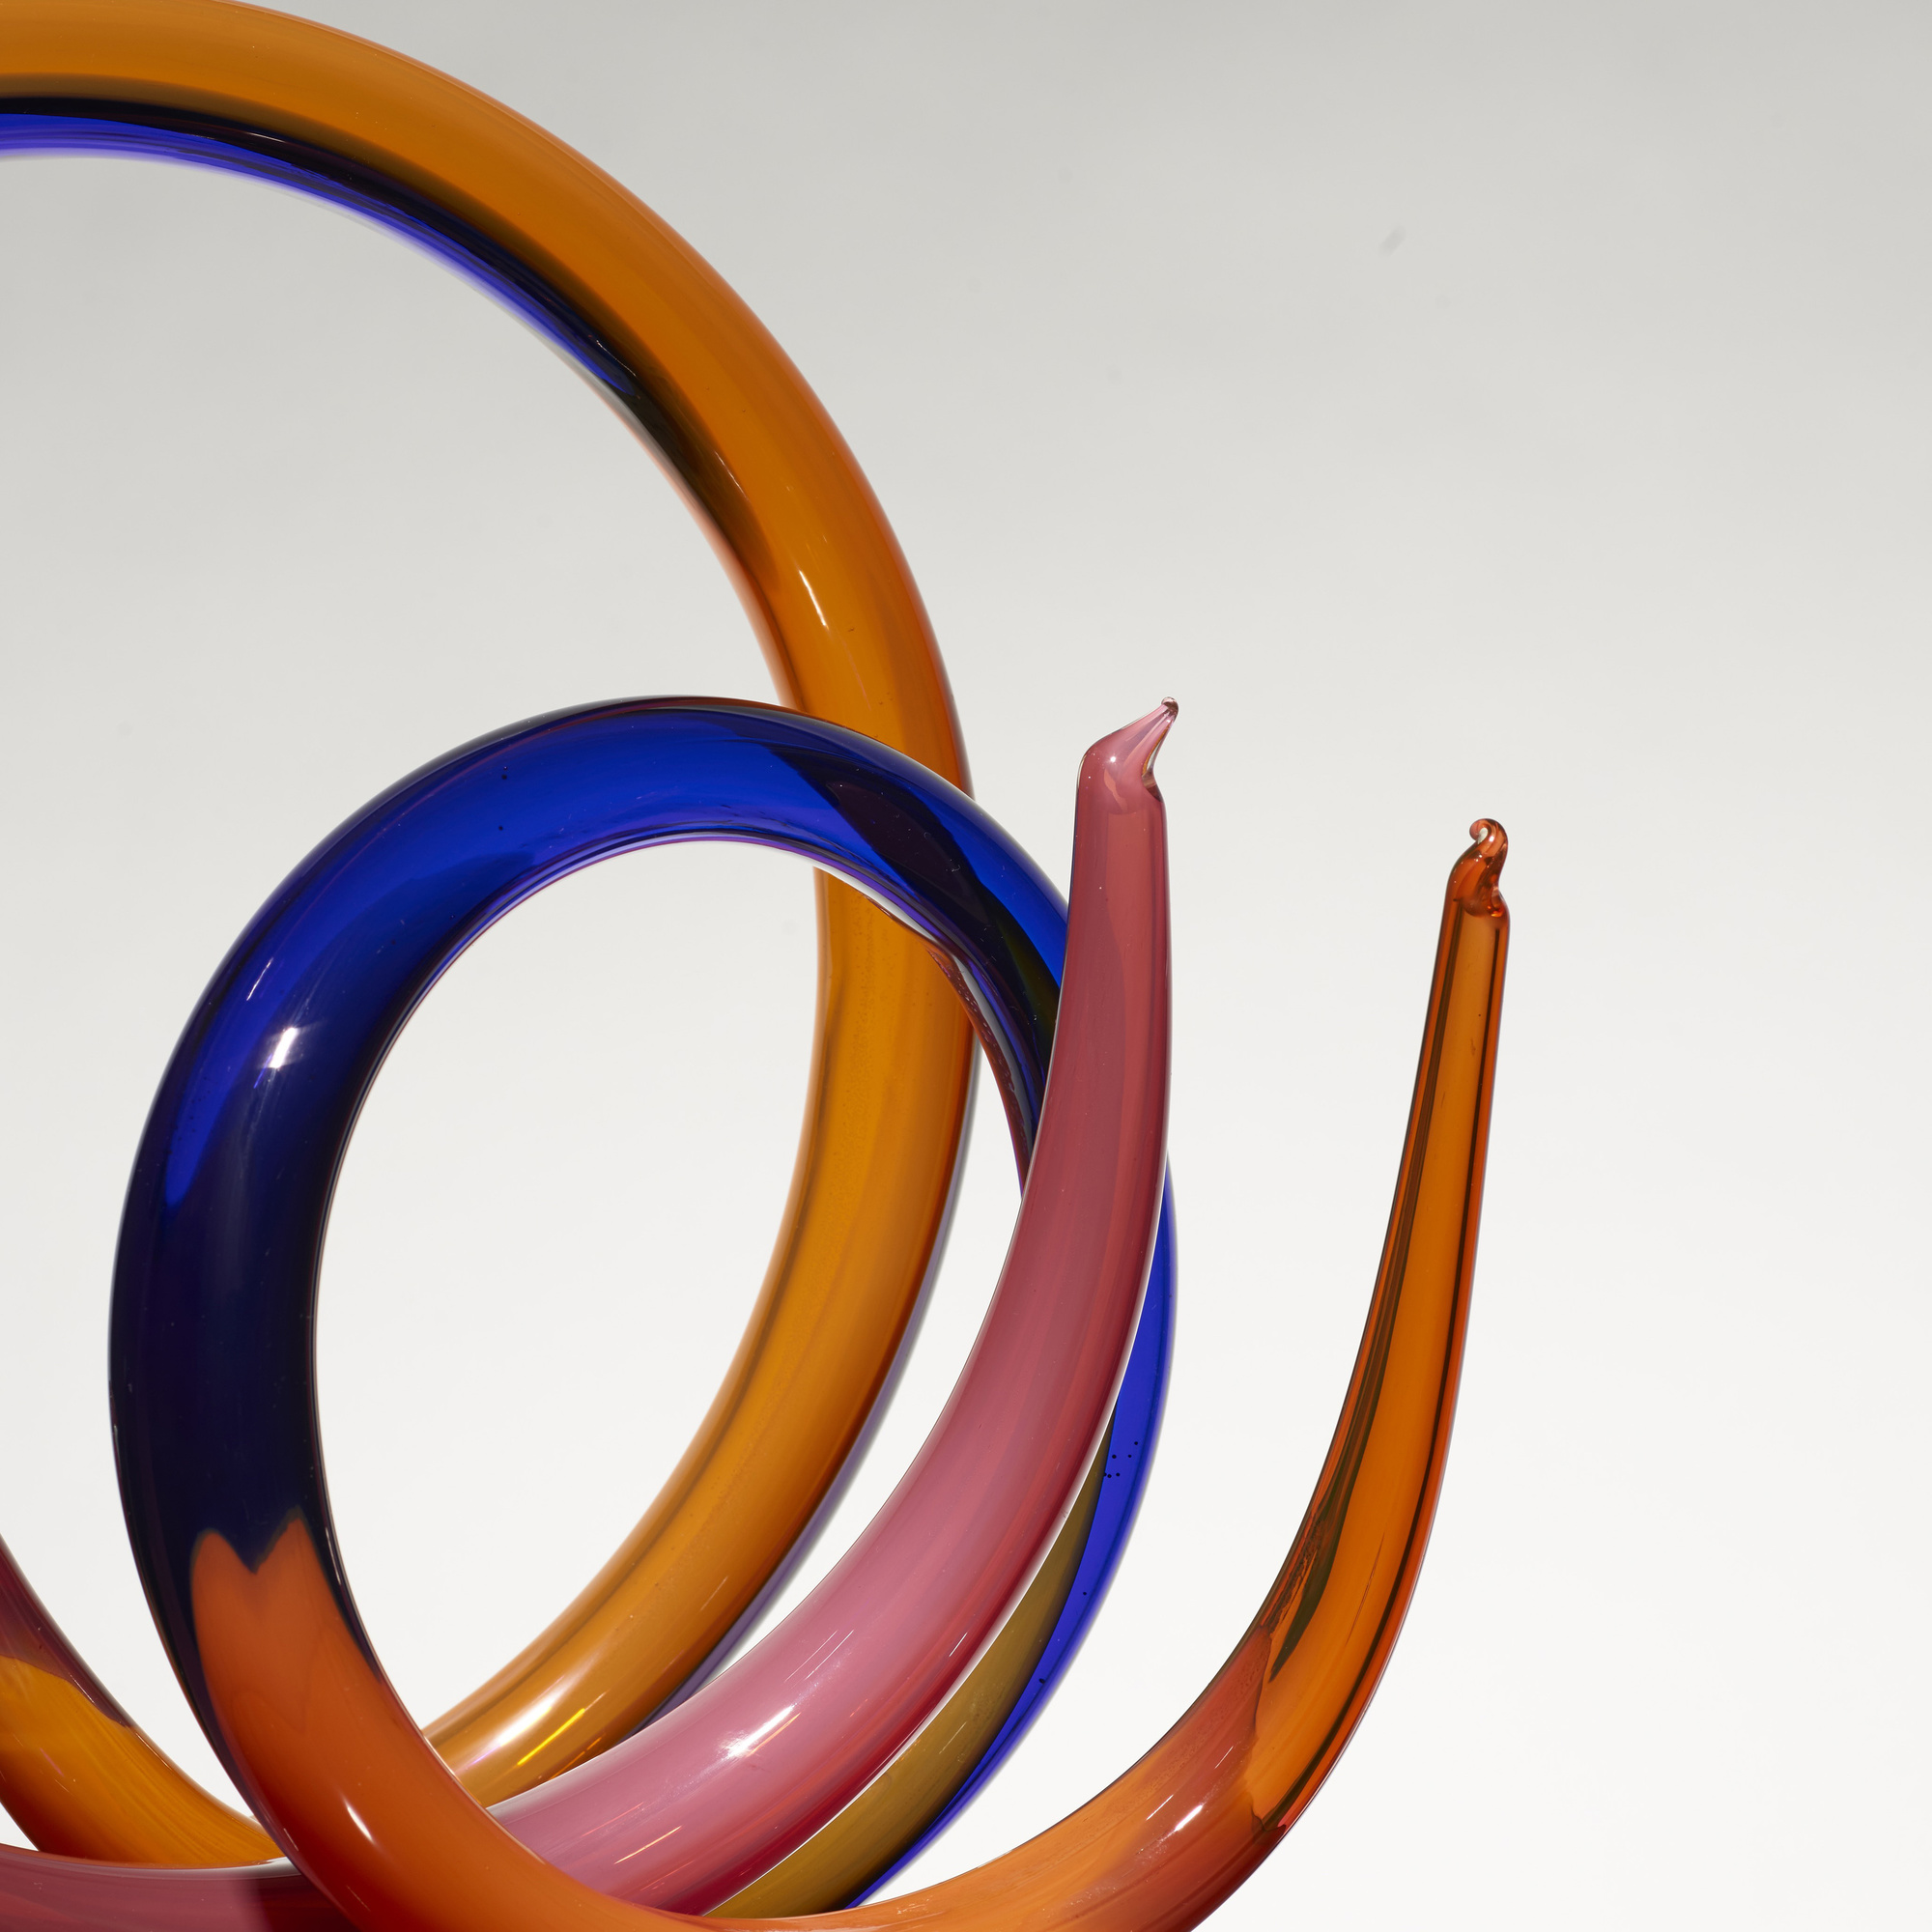 147: Paul Seide / Spiral Neon (2 of 4)